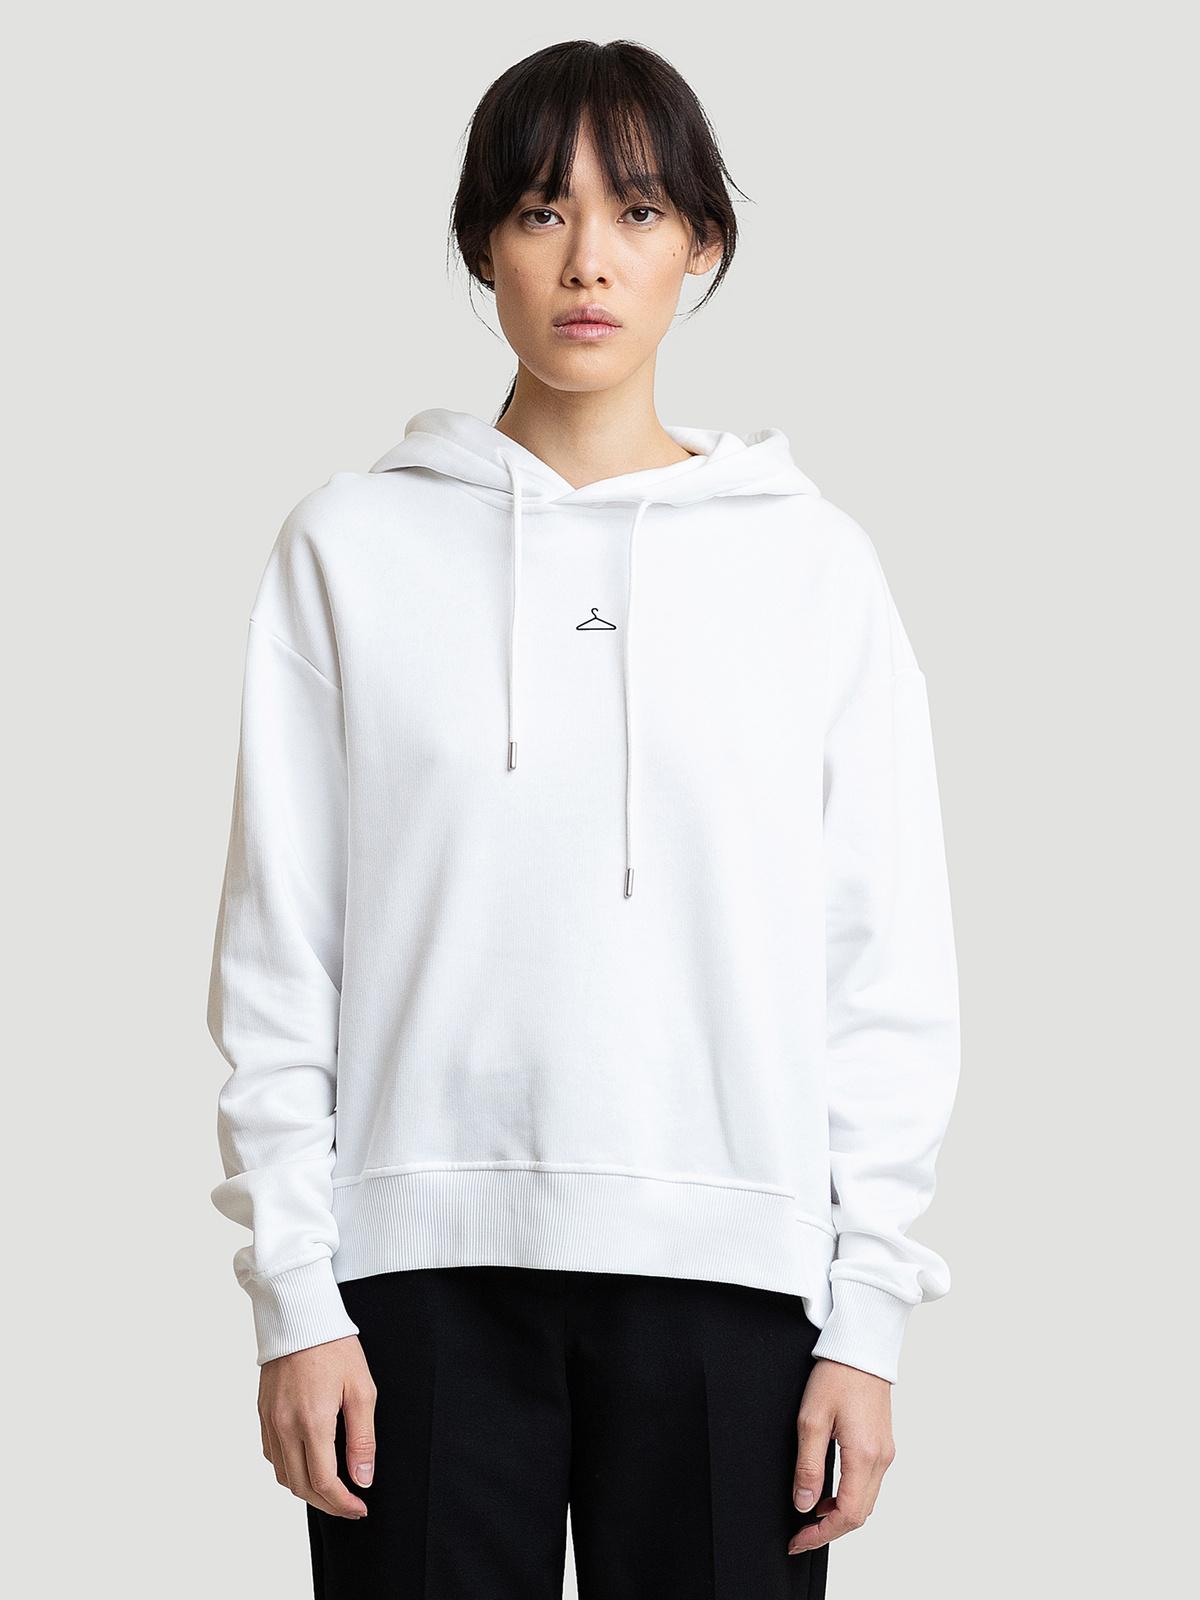 Hanger Hoodie White 5